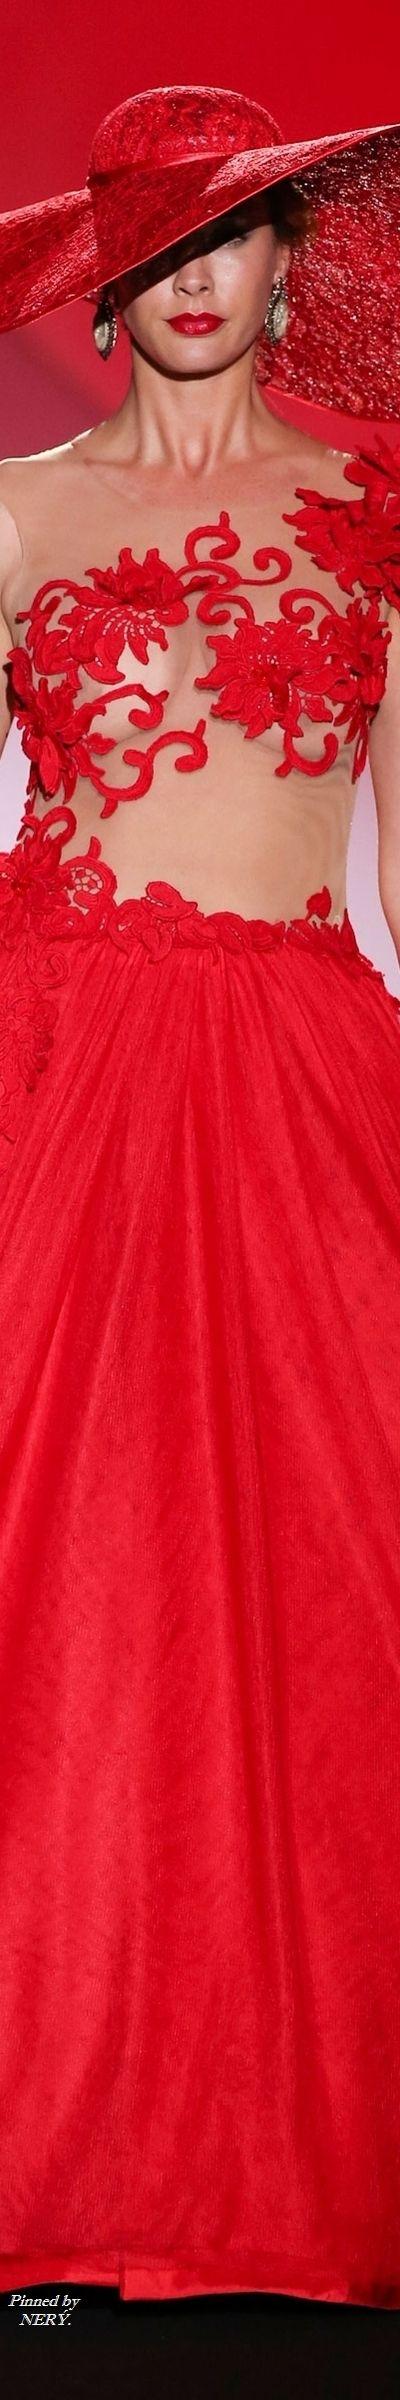 SONIA PENA - Spring 2017 Bridal